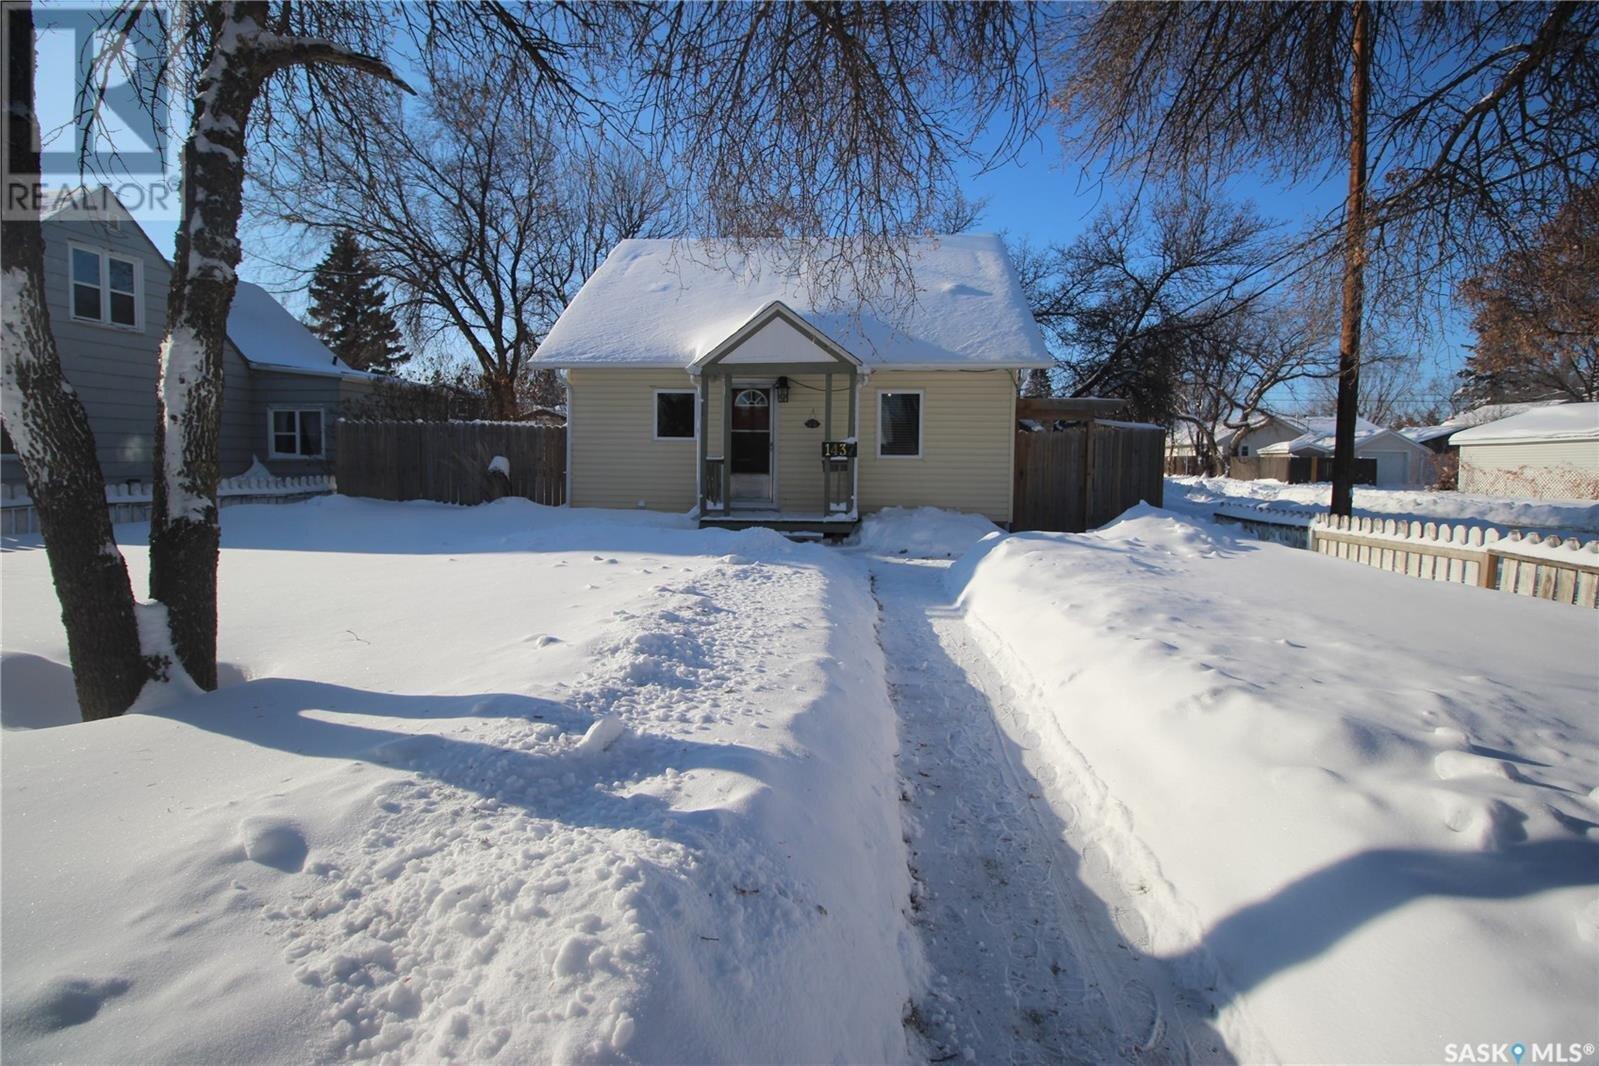 House for sale at 1437 C Ave N Saskatoon Saskatchewan - MLS: SK833628